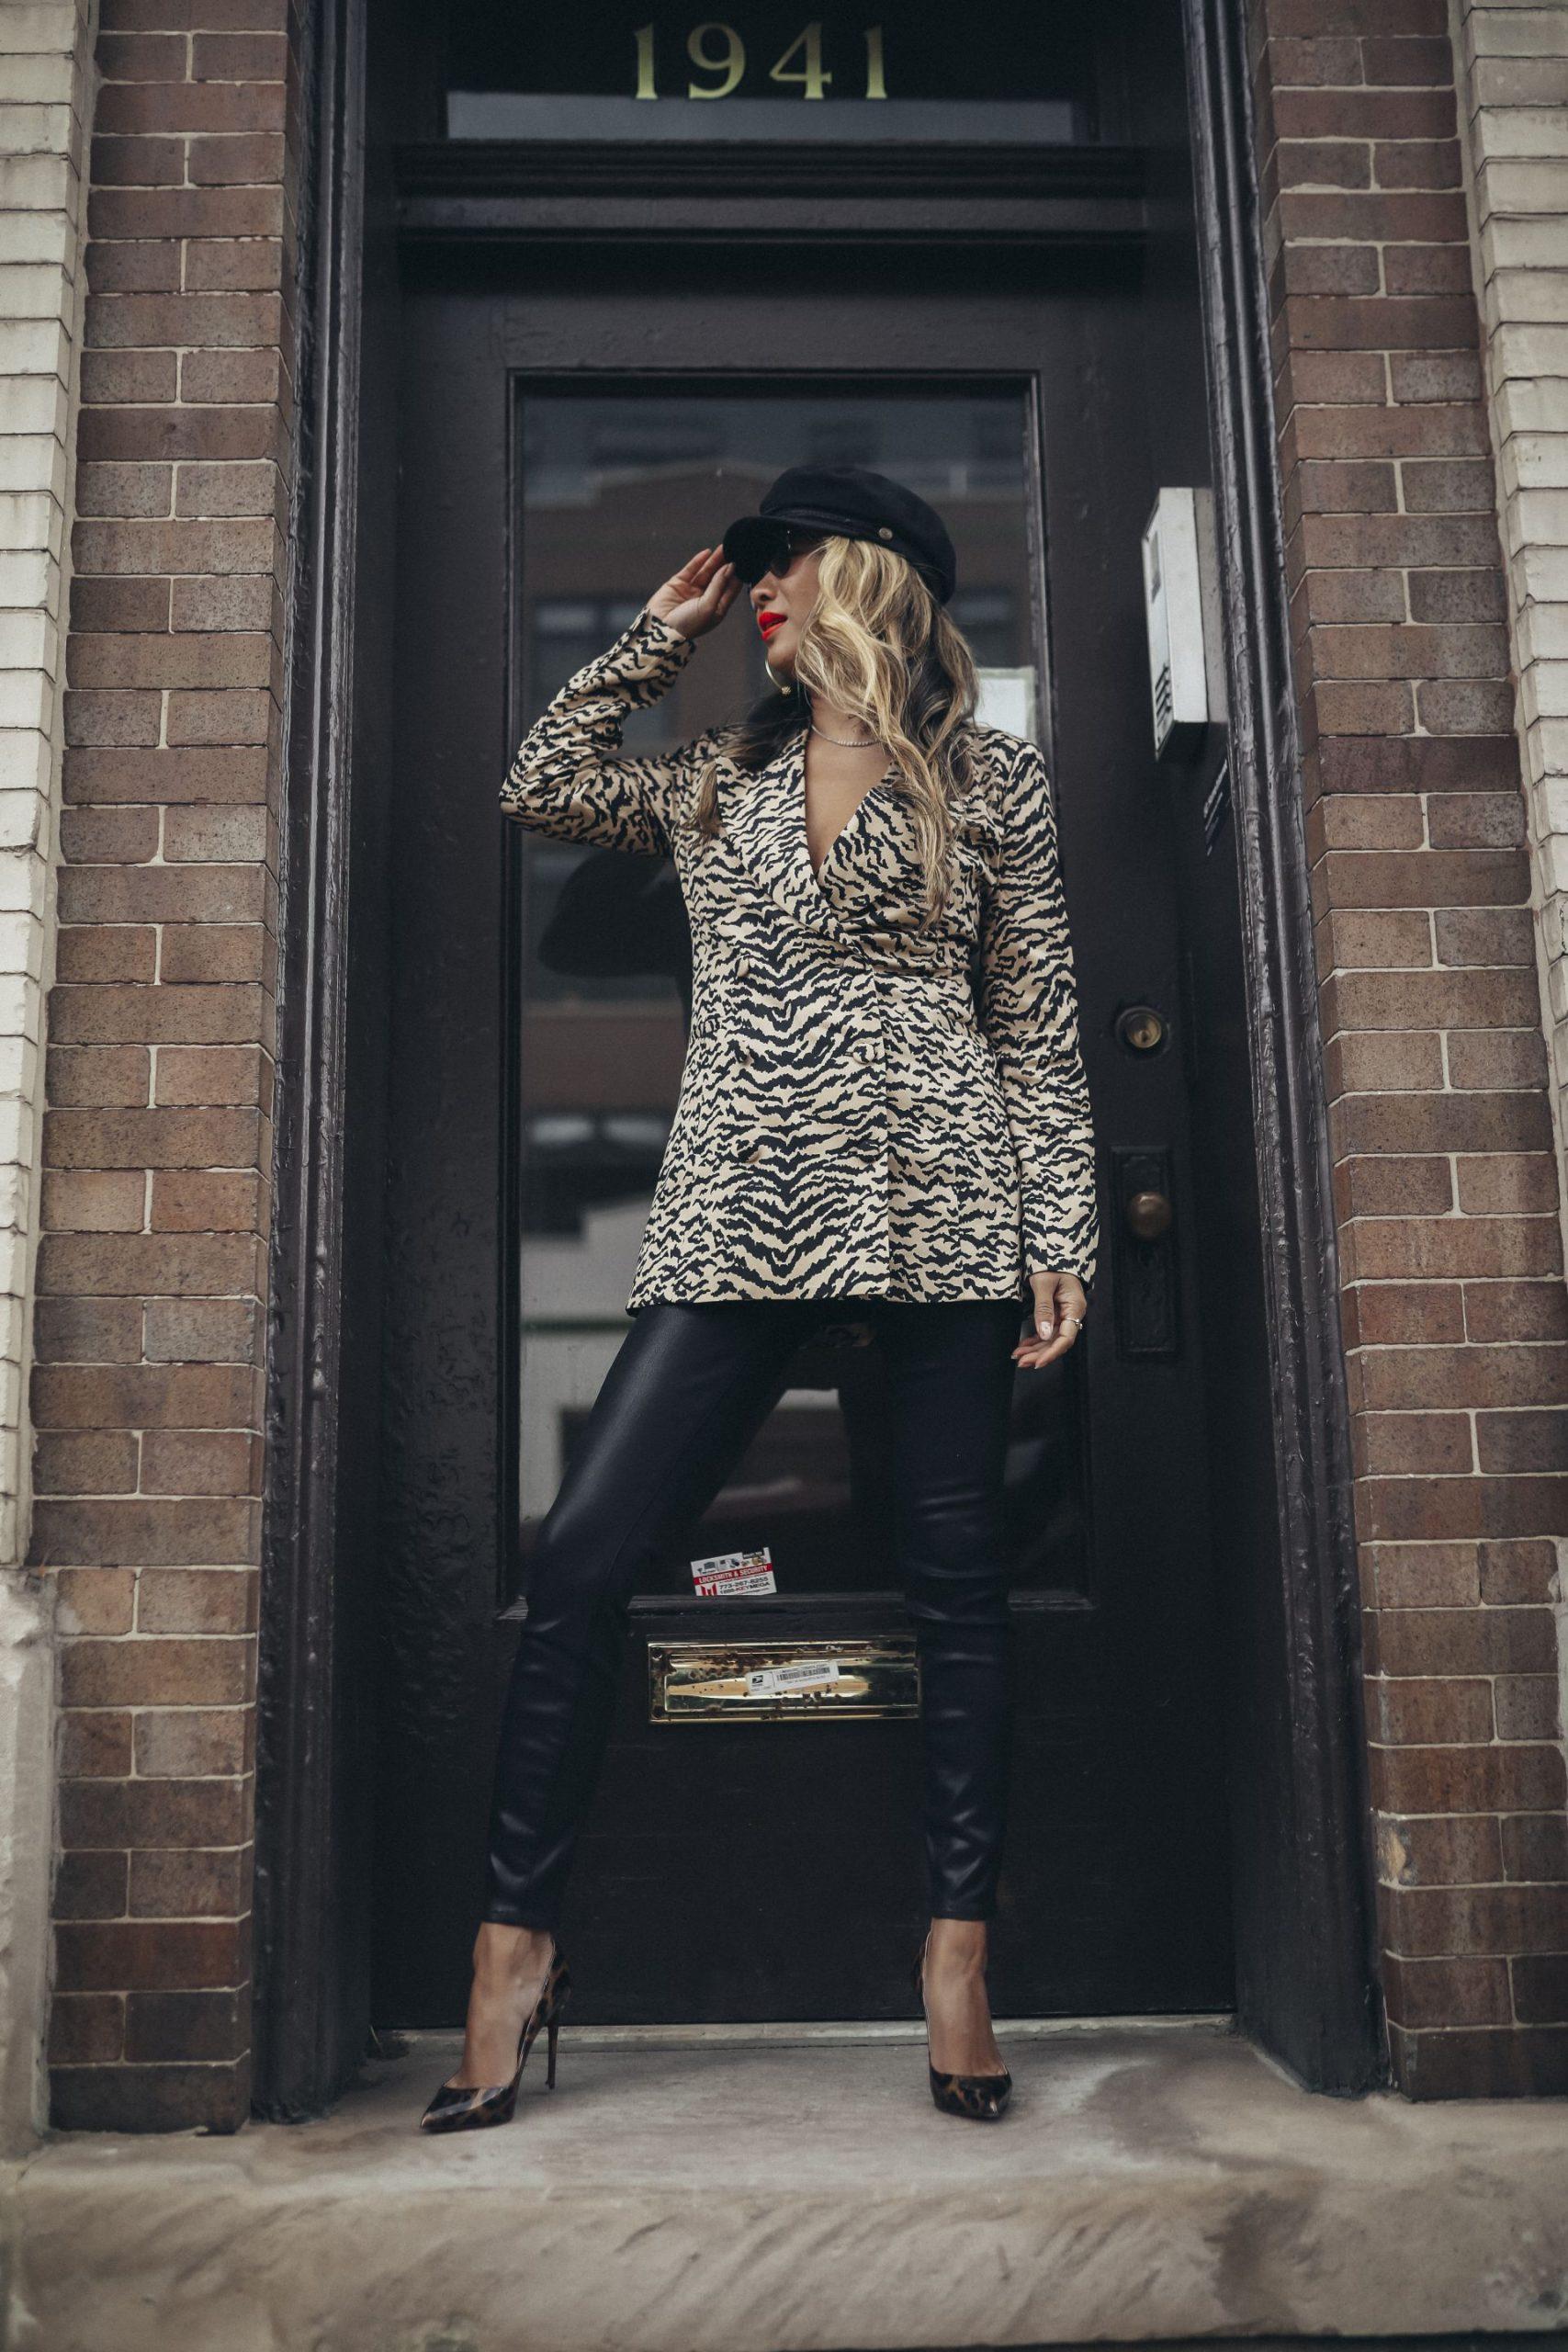 Good American coated Denim, Good American zebra print blazer, Jennifer Worman, Best Chicago Blogger